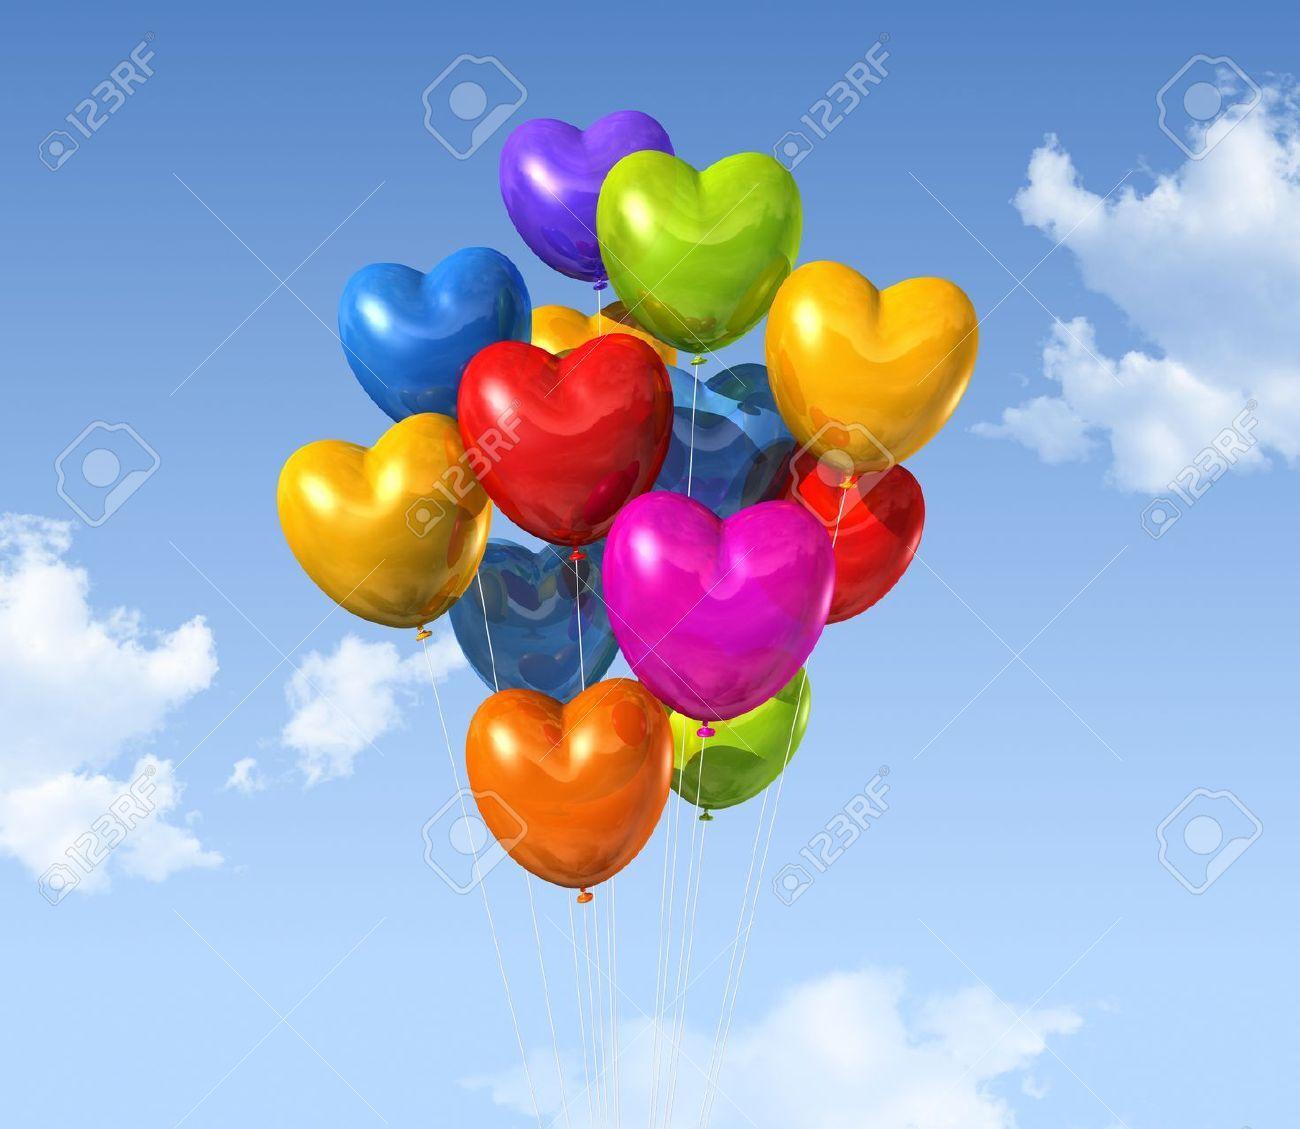 M s de 25 ideas incre bles sobre globos corazon en - Bombas de cumpleanos ...